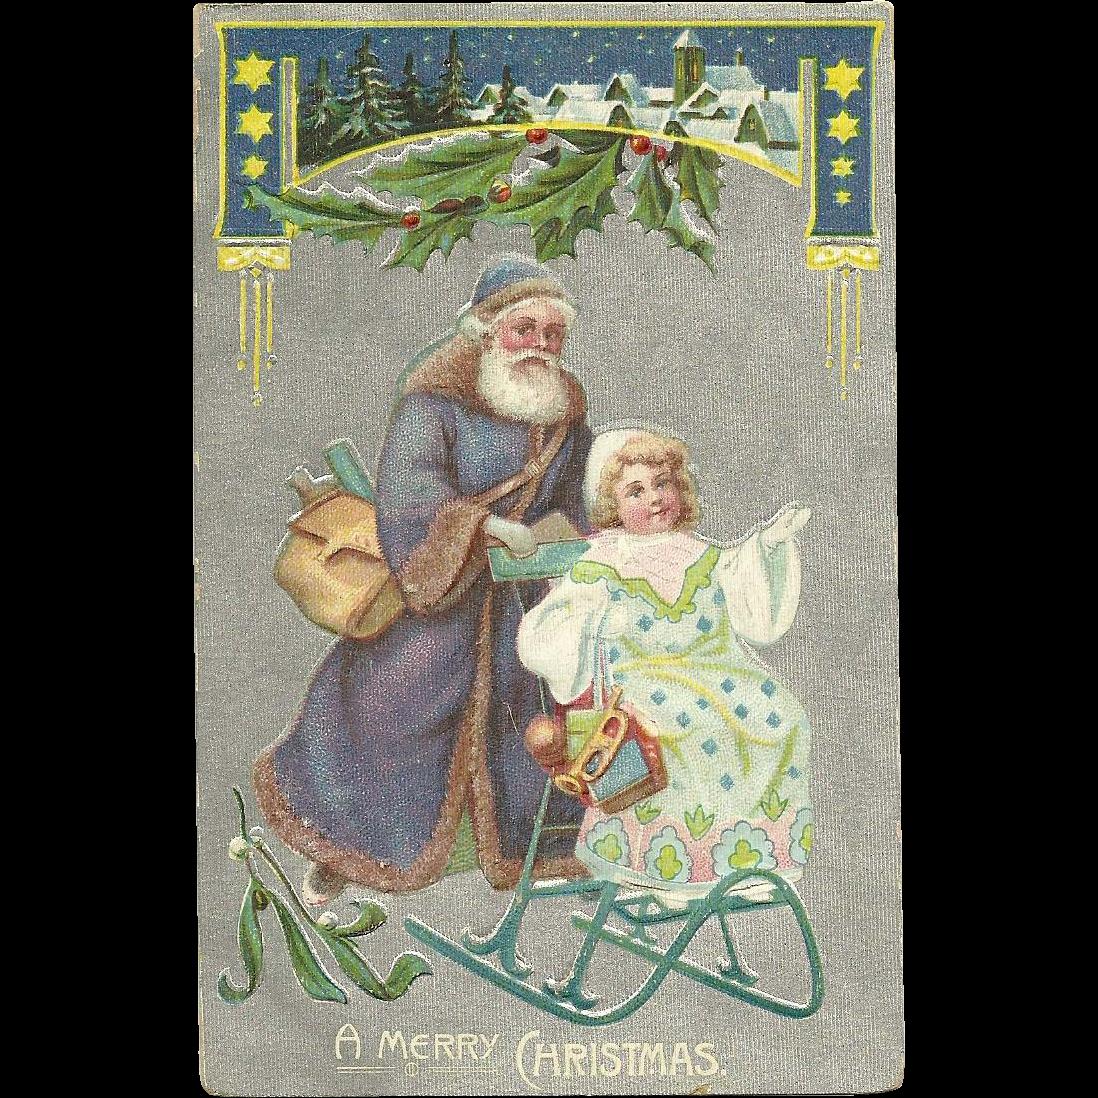 Embossed Blue - Purple Robed Santa Pushes girl on sleigh Christmas Postcard